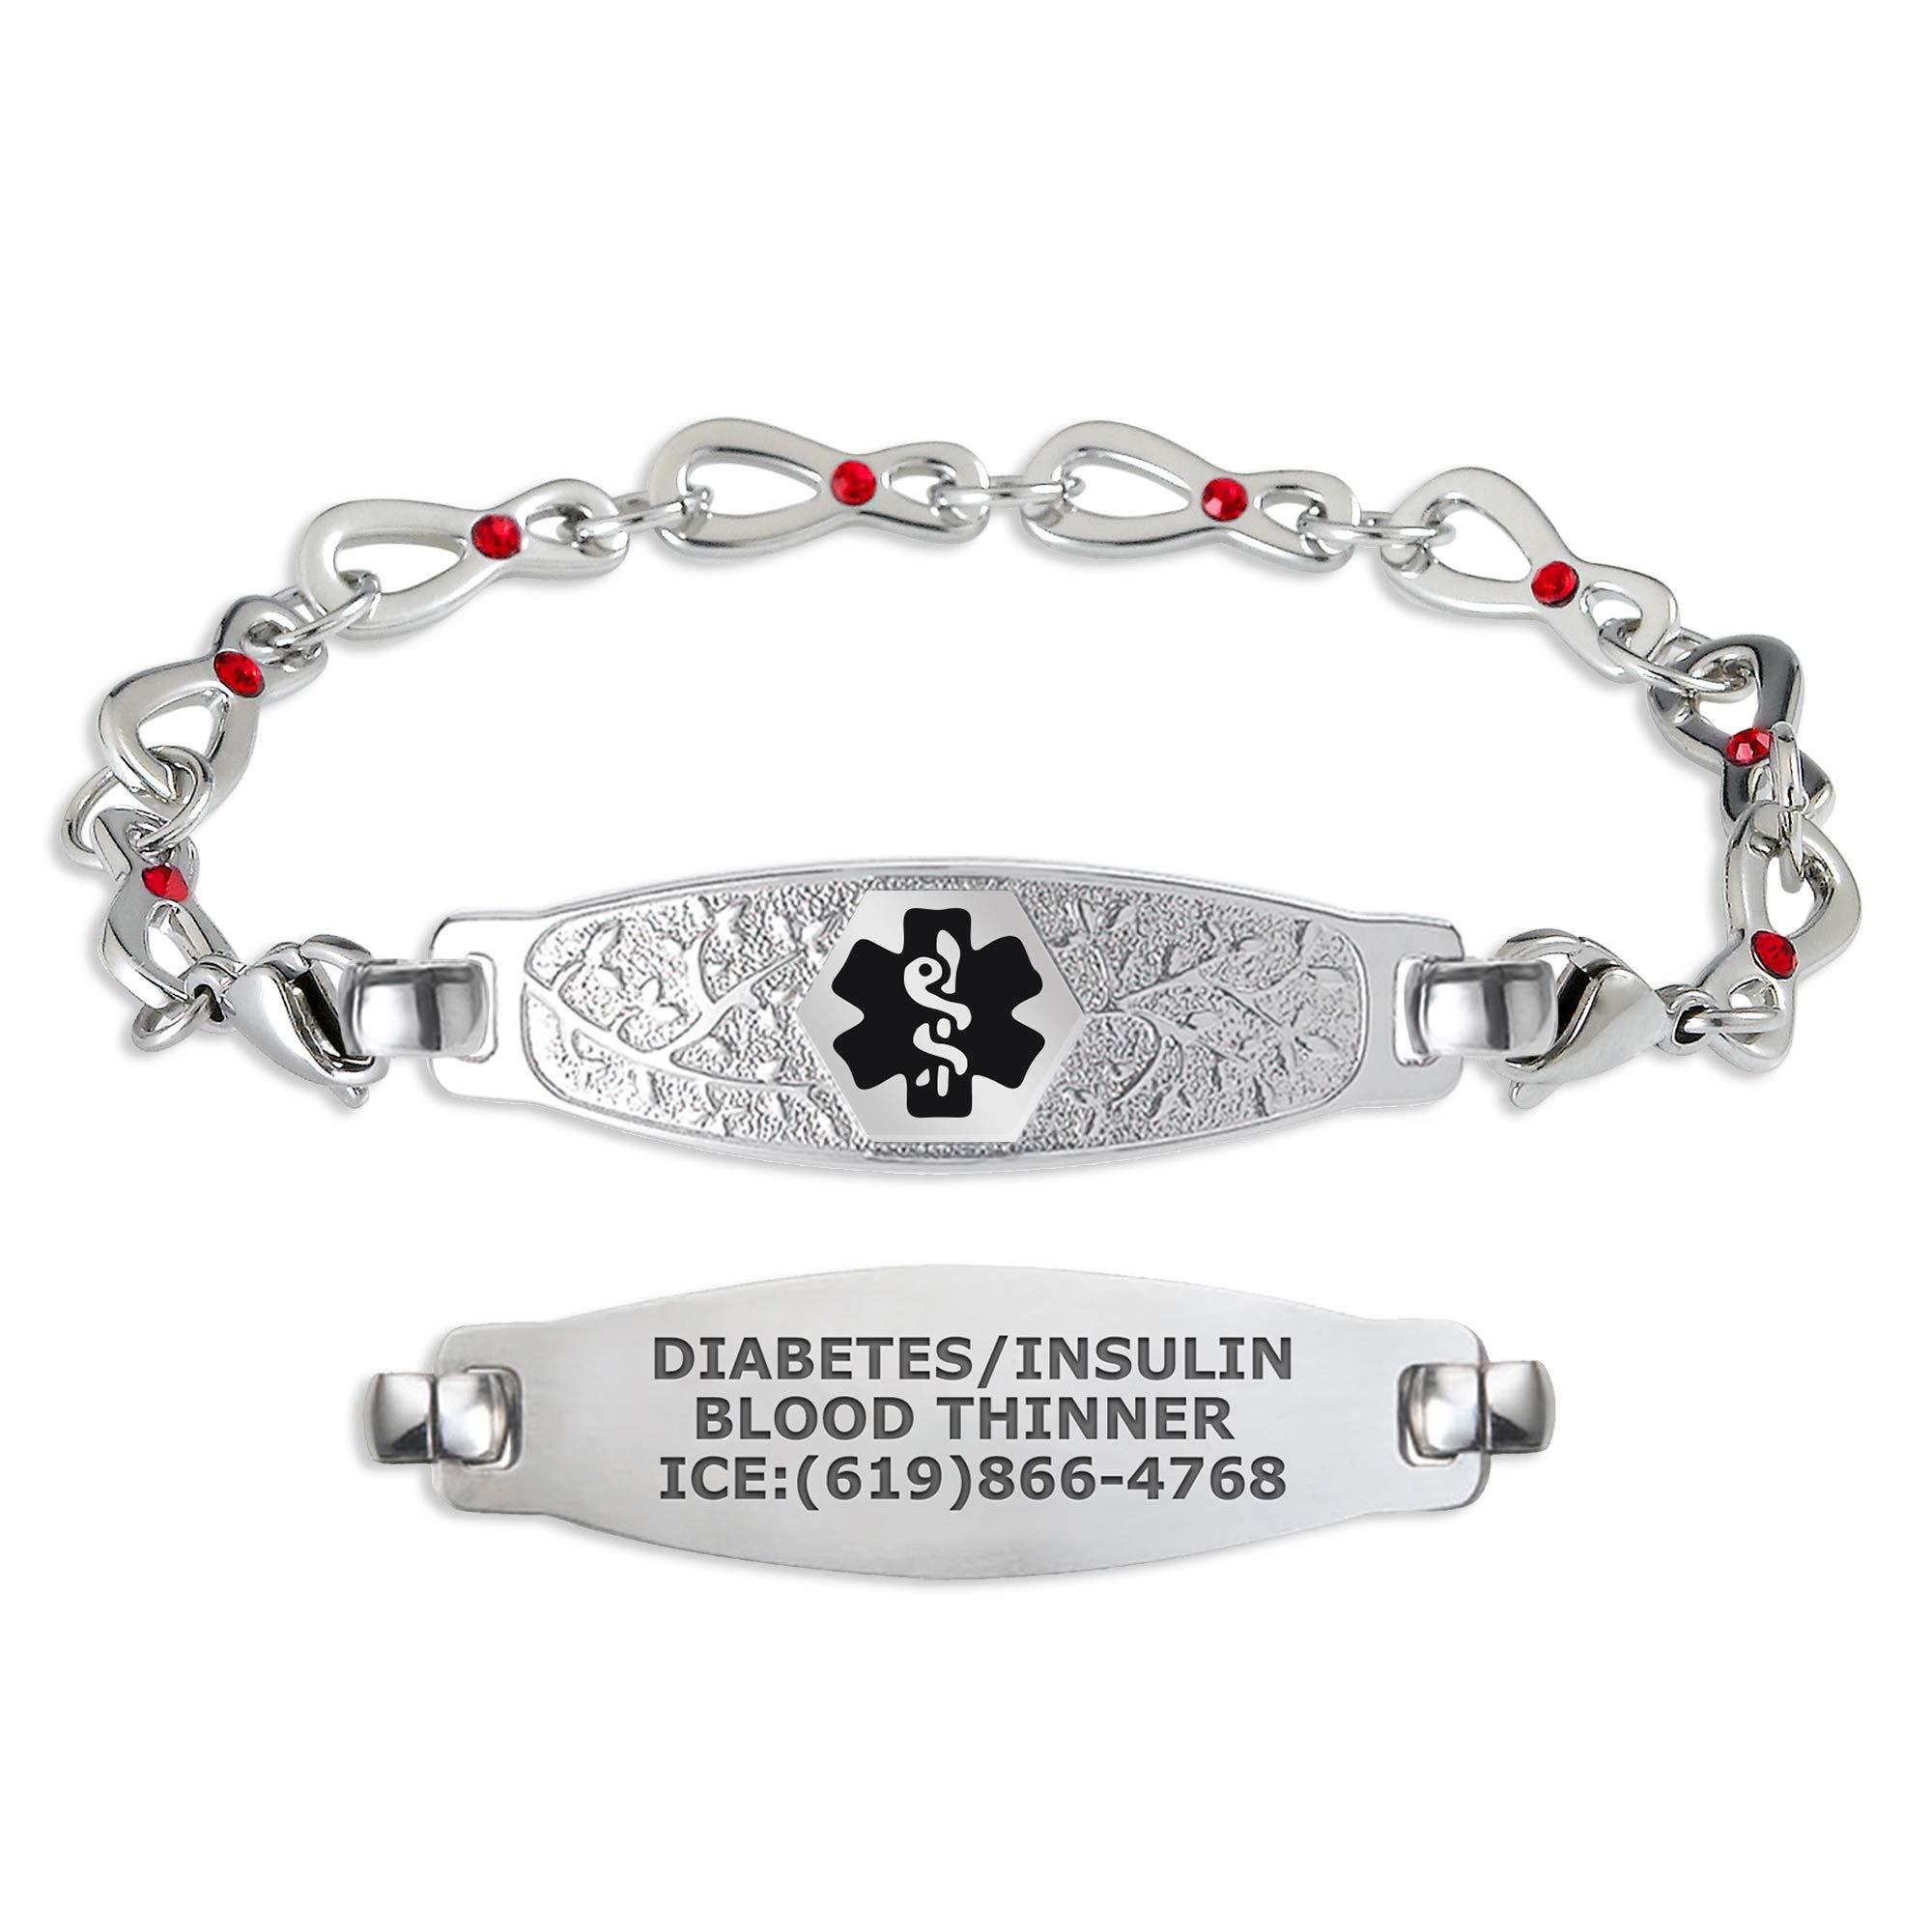 Divoti Custom Engraved Medical Alert Bracelets for Women, Stainless Steel Medical Bracelet, Medical ID Bracelet w/Free Engraving – Beautiful Olive Tag w/Infinity Rose Crystal – Color/Size